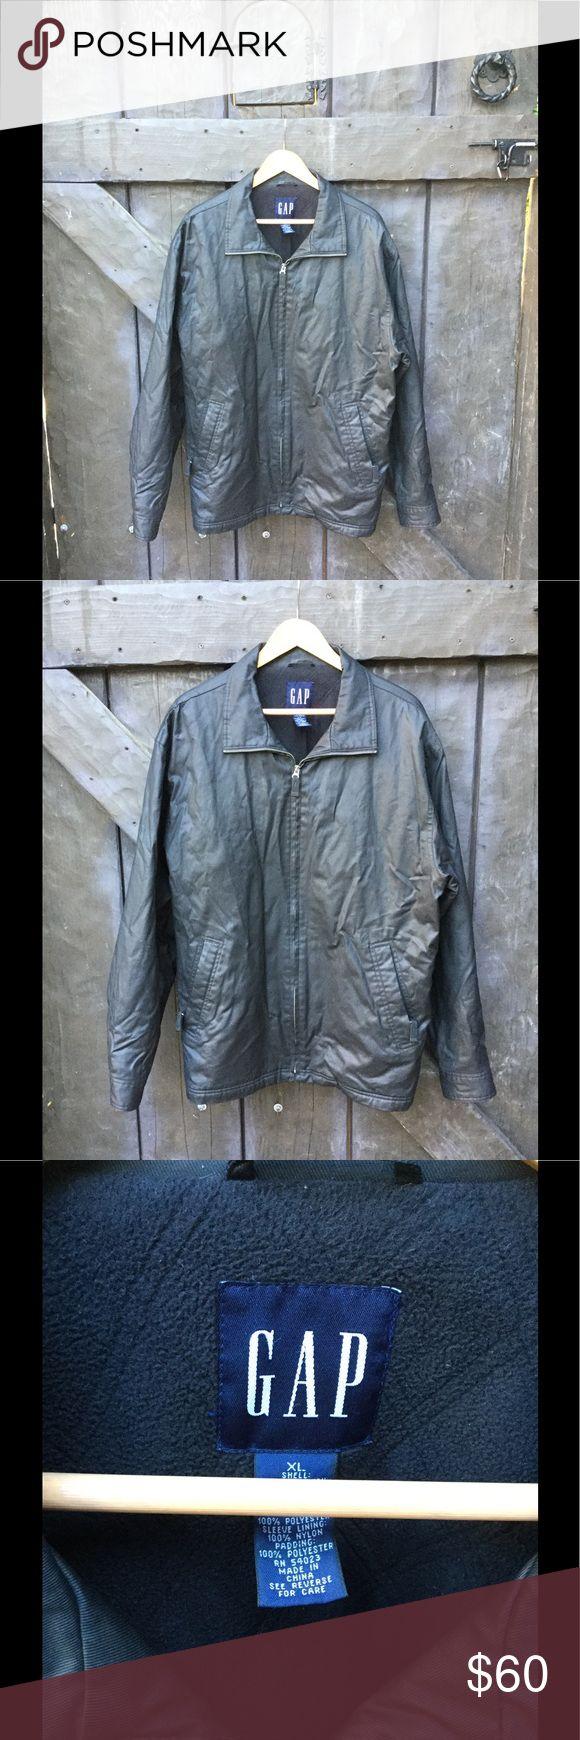 Gap men's Black faux leather jacket XL Gap men's Black faux leather jacket XL GAP Jackets & Coats Lightweight & Shirt Jackets